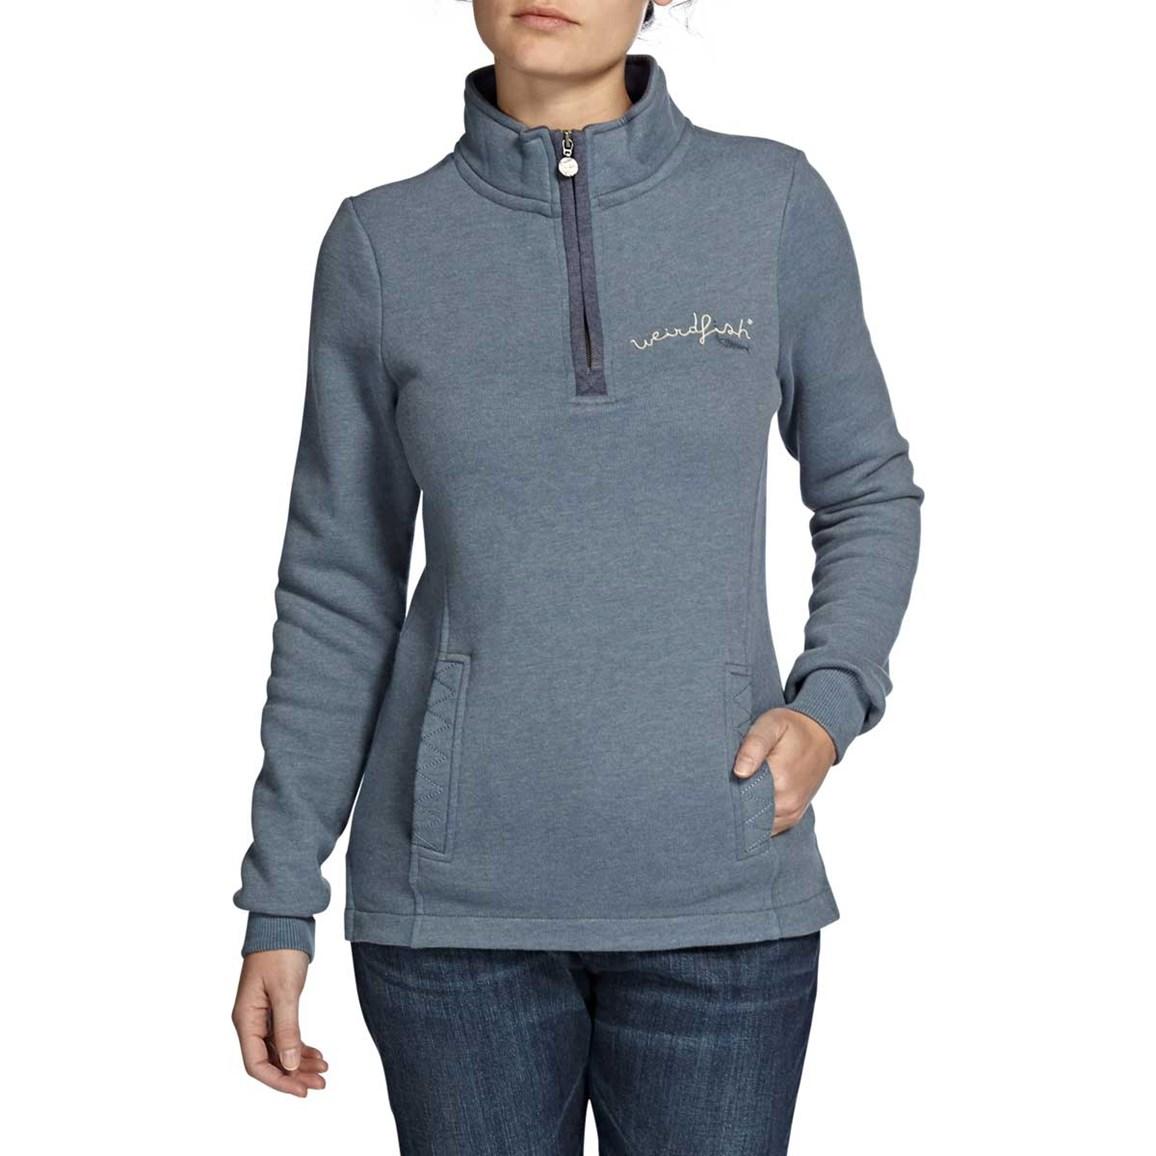 Aurora 1/4 Zip Graphic Print Sweatshirt Storm